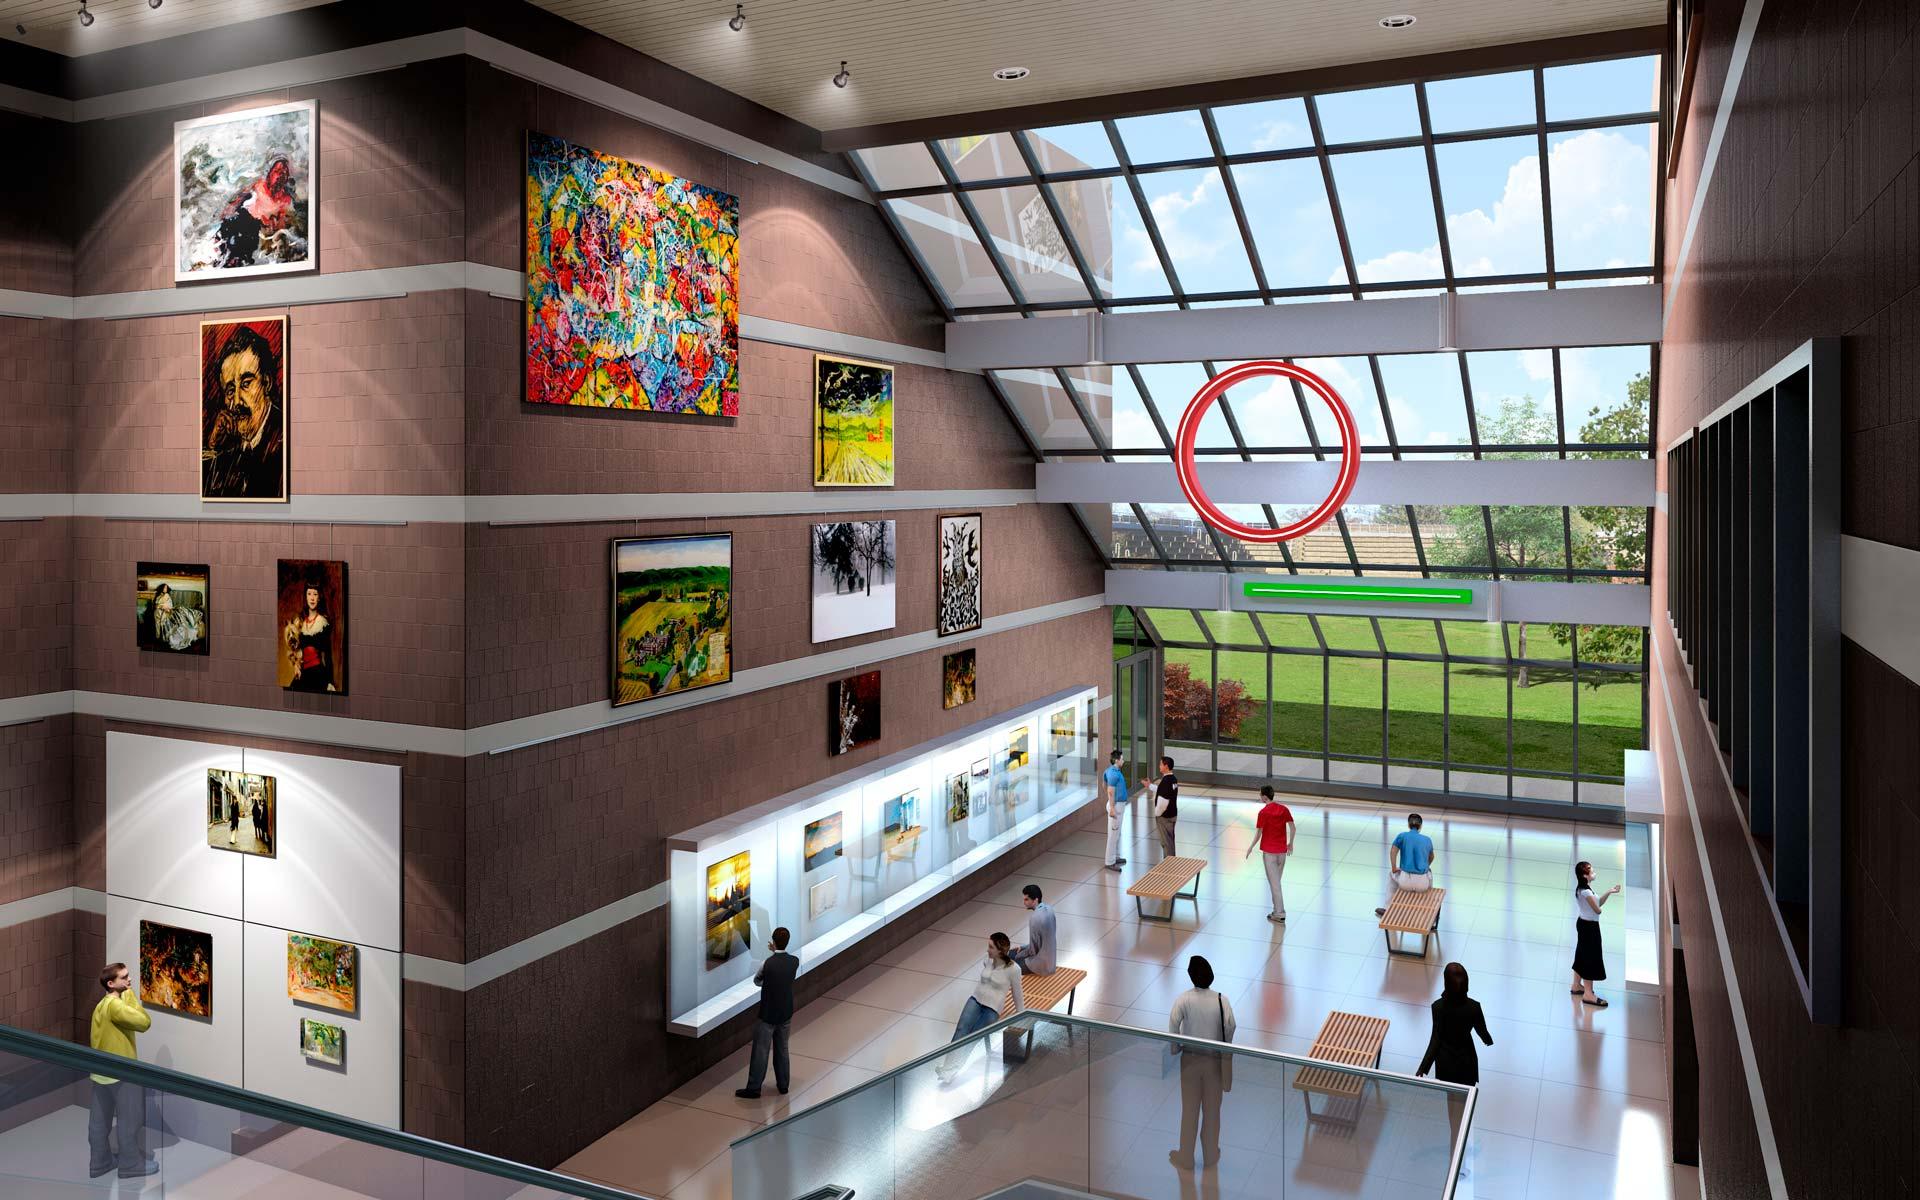 votos-529-Atrium-Art-Gallery-Rockland-County-NY